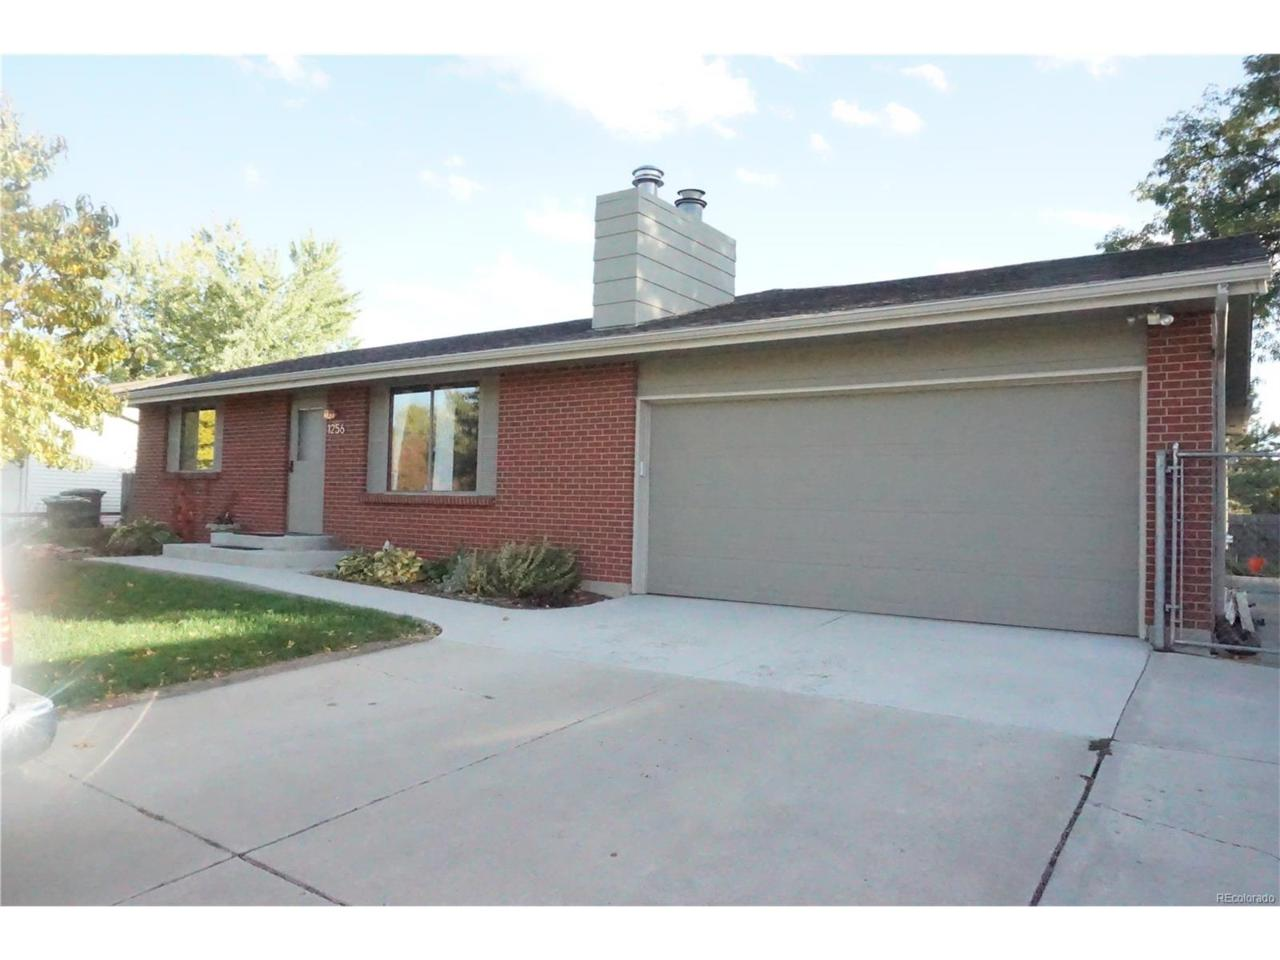 1256 Alpine Place, Loveland, CO 80538 (MLS #8183771) :: 8z Real Estate